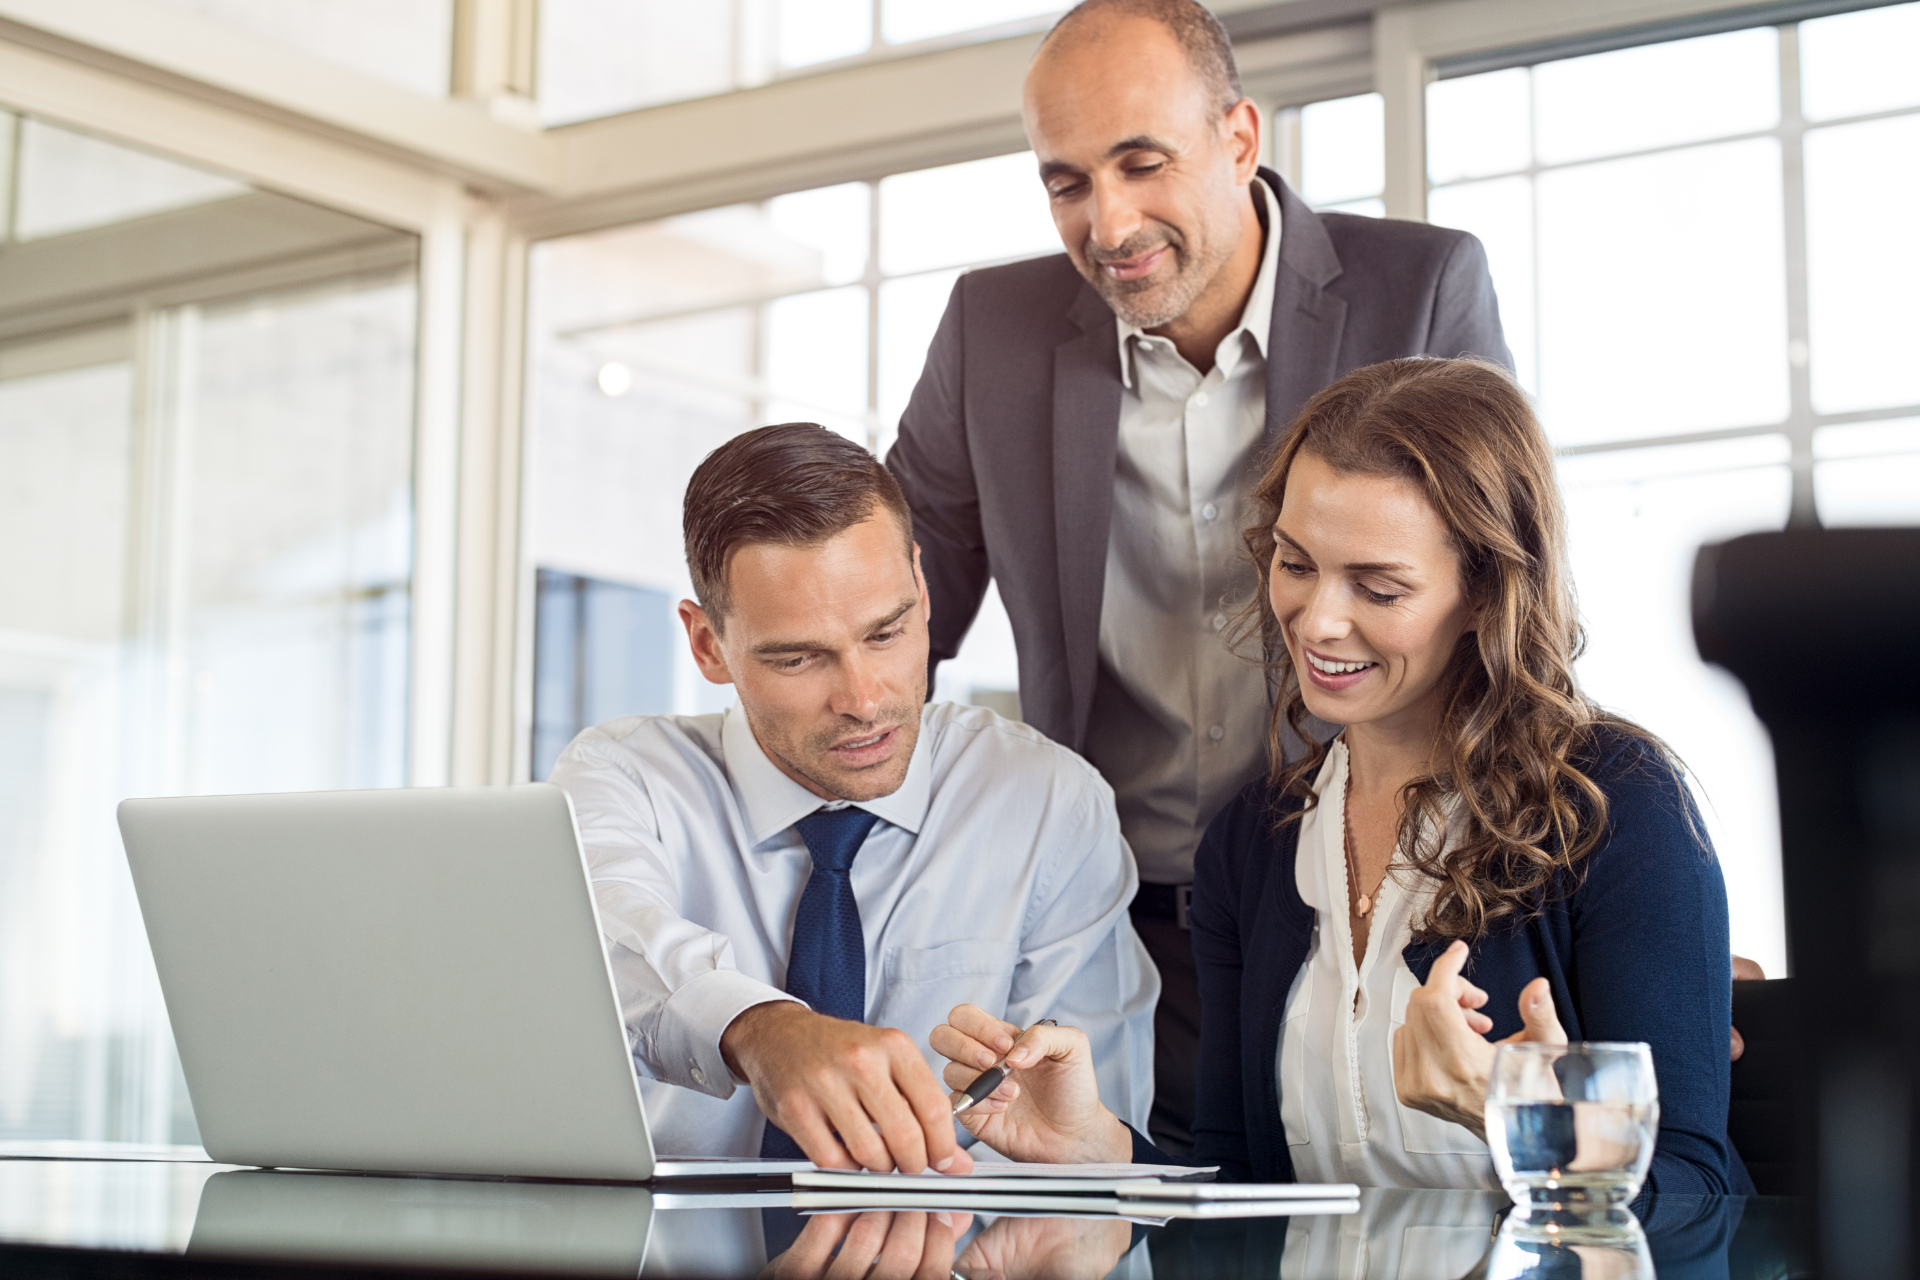 Ausloans finance aggregator marketing support 22